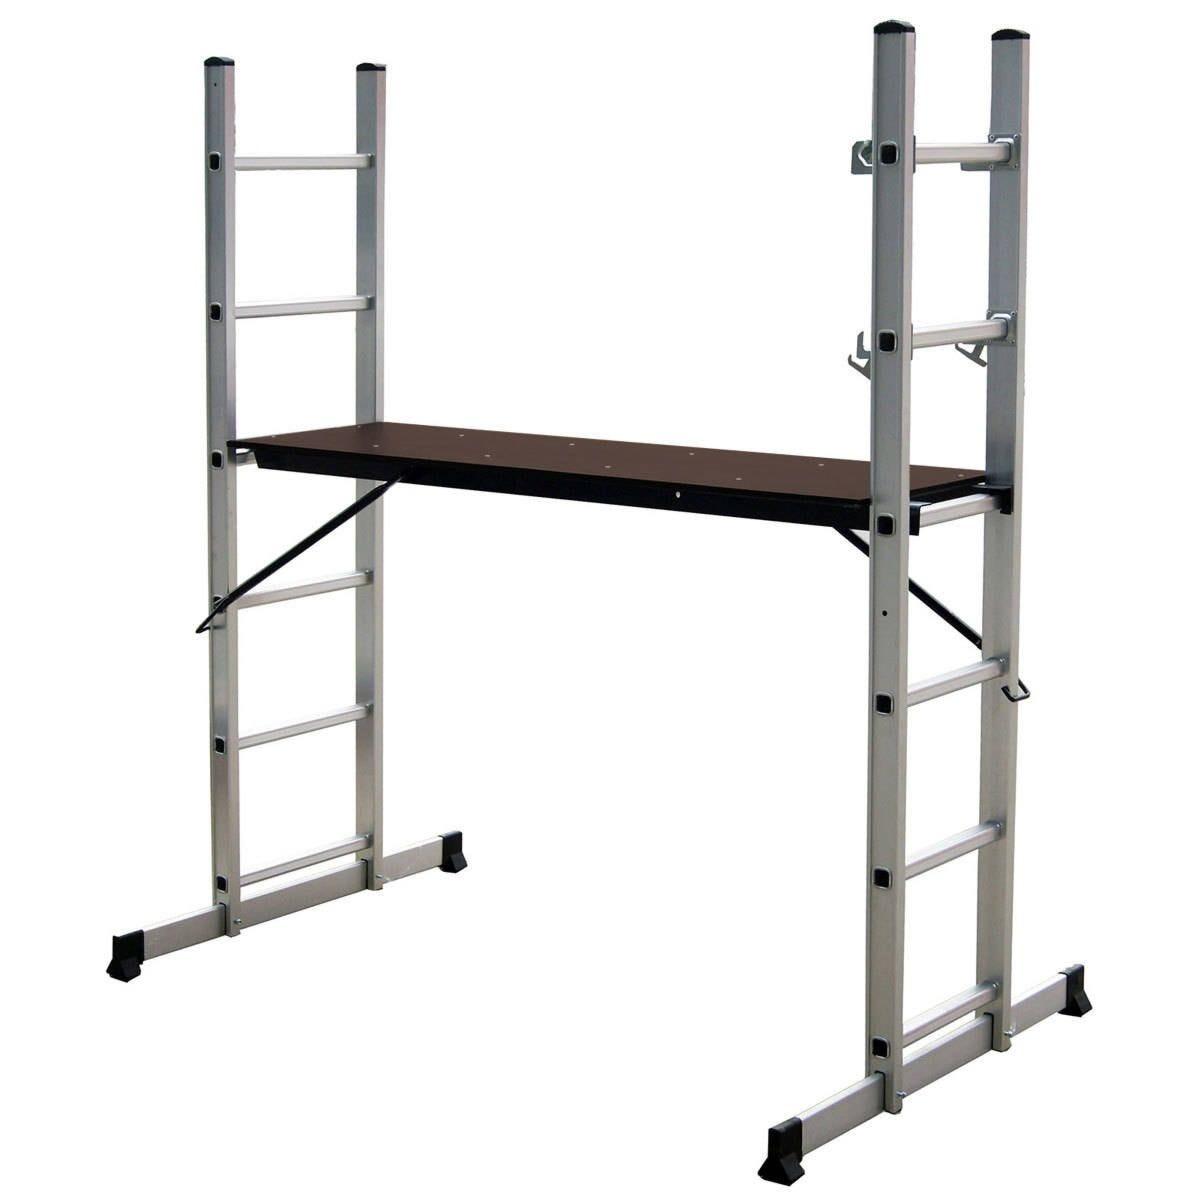 Charles Bentley 5 Way Aluminium Multi Purpose Scaffolding Ladder with Working Platform